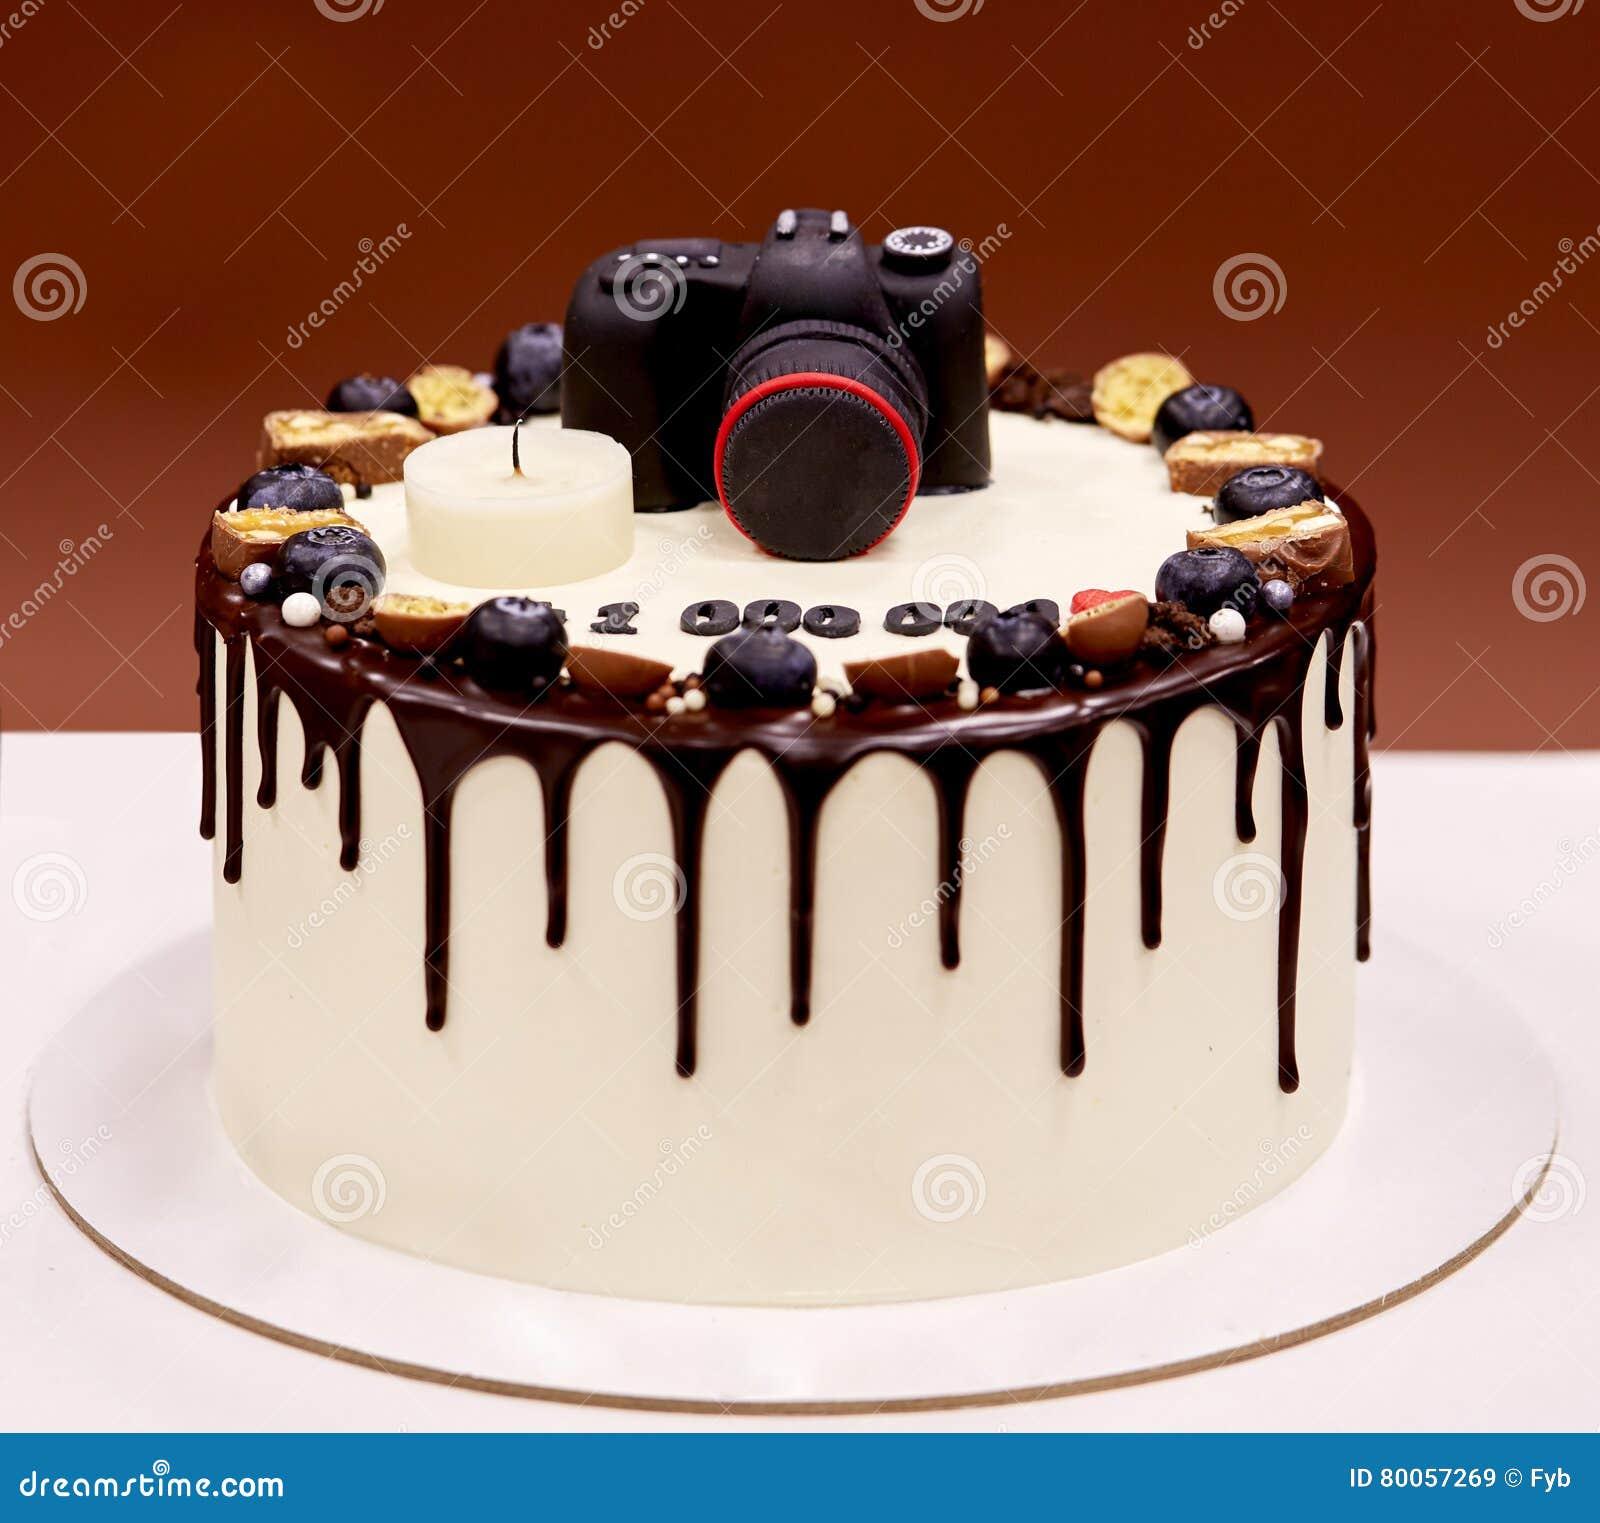 Birthday Cake Photo Camera : Photographers Birthday Cake With A Photo Camera On Top ...